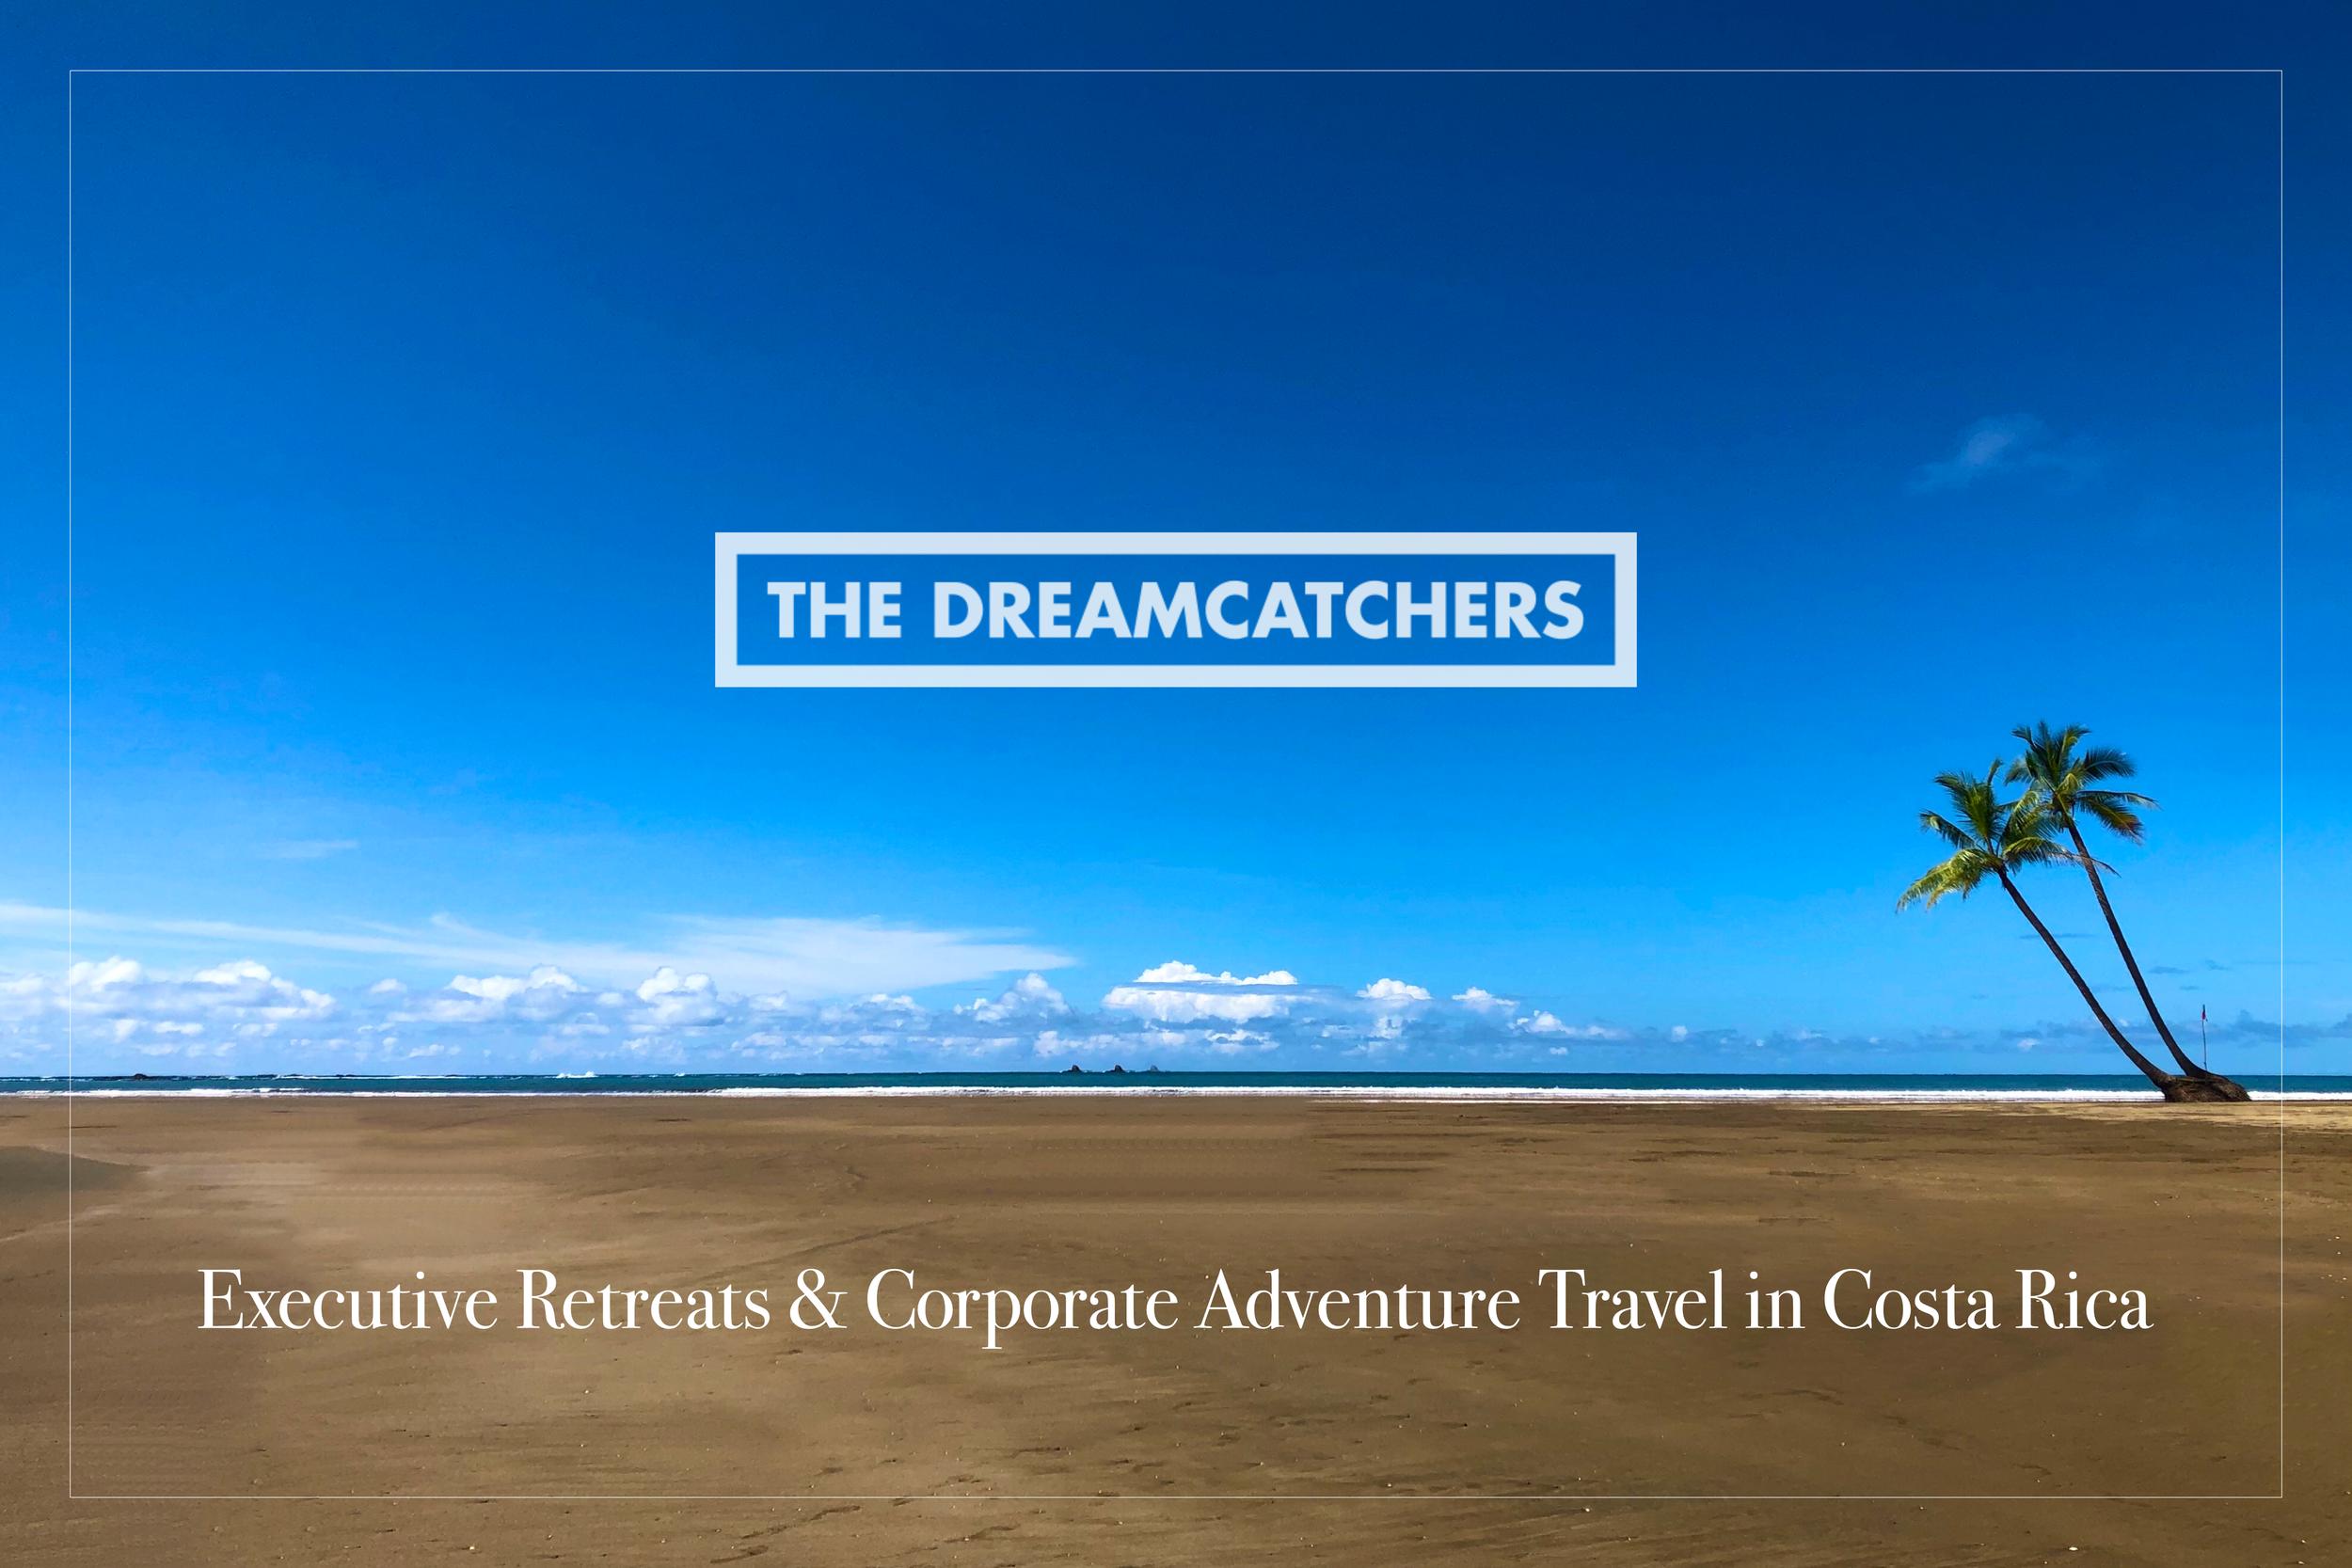 The Dreamcatchers Executive Retreats and Corporate Adventure Travel